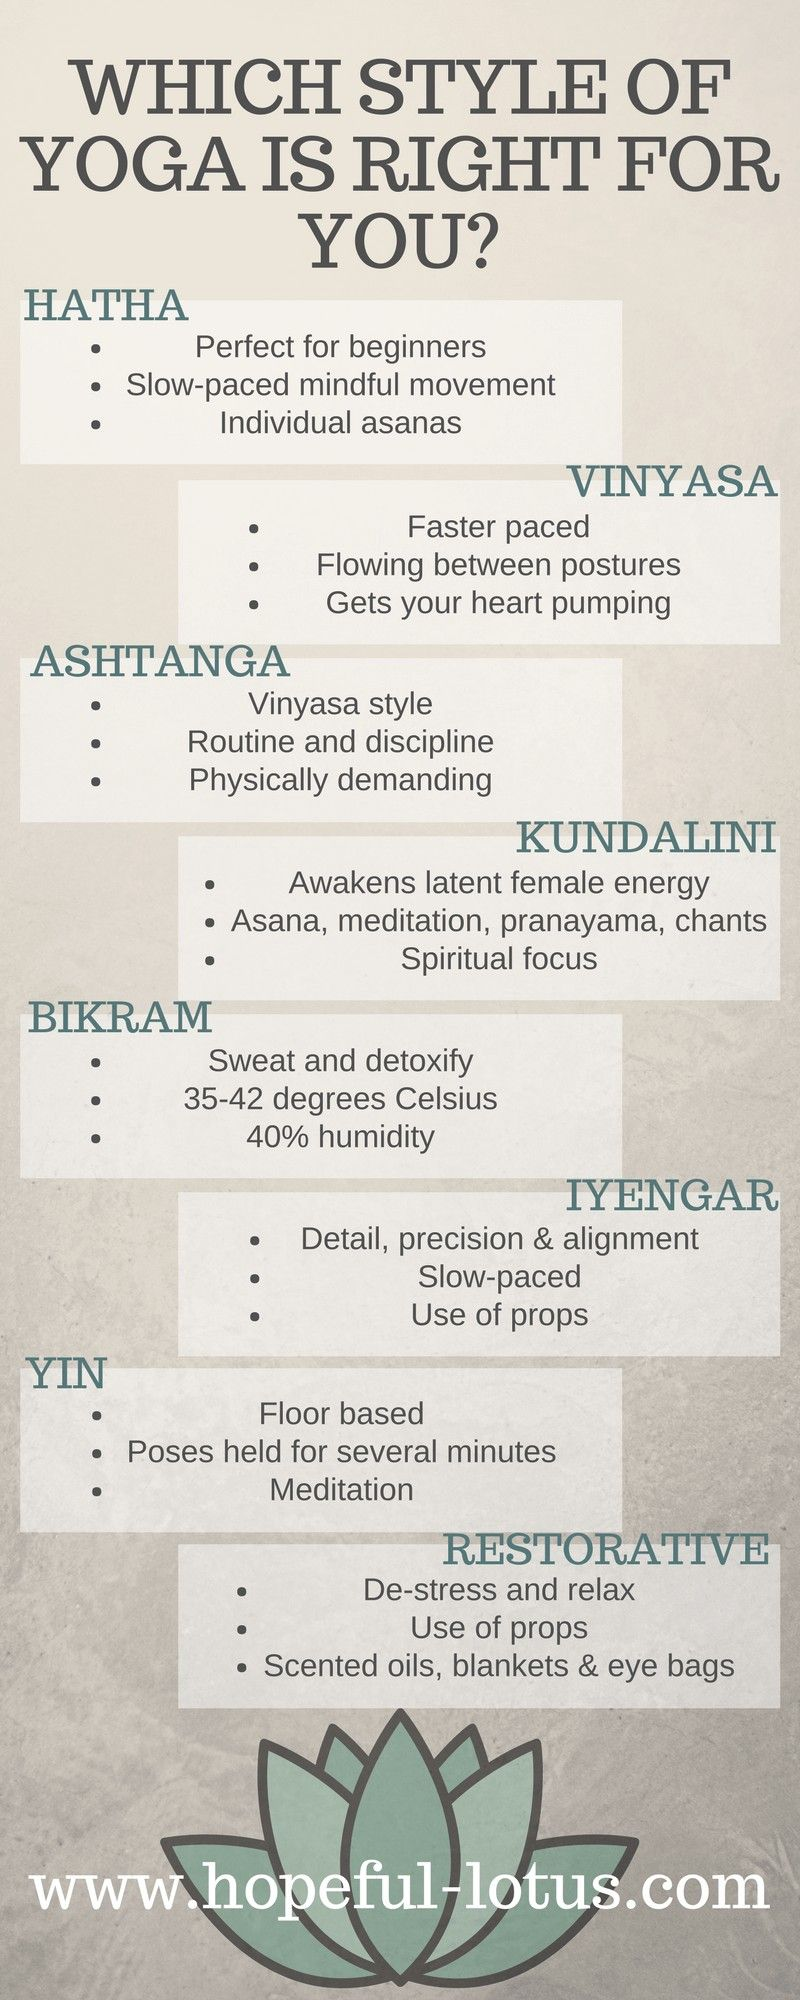 #inspiration #flexibility #lotussport #beginners #confusing #different #benefits #beginner #practice...